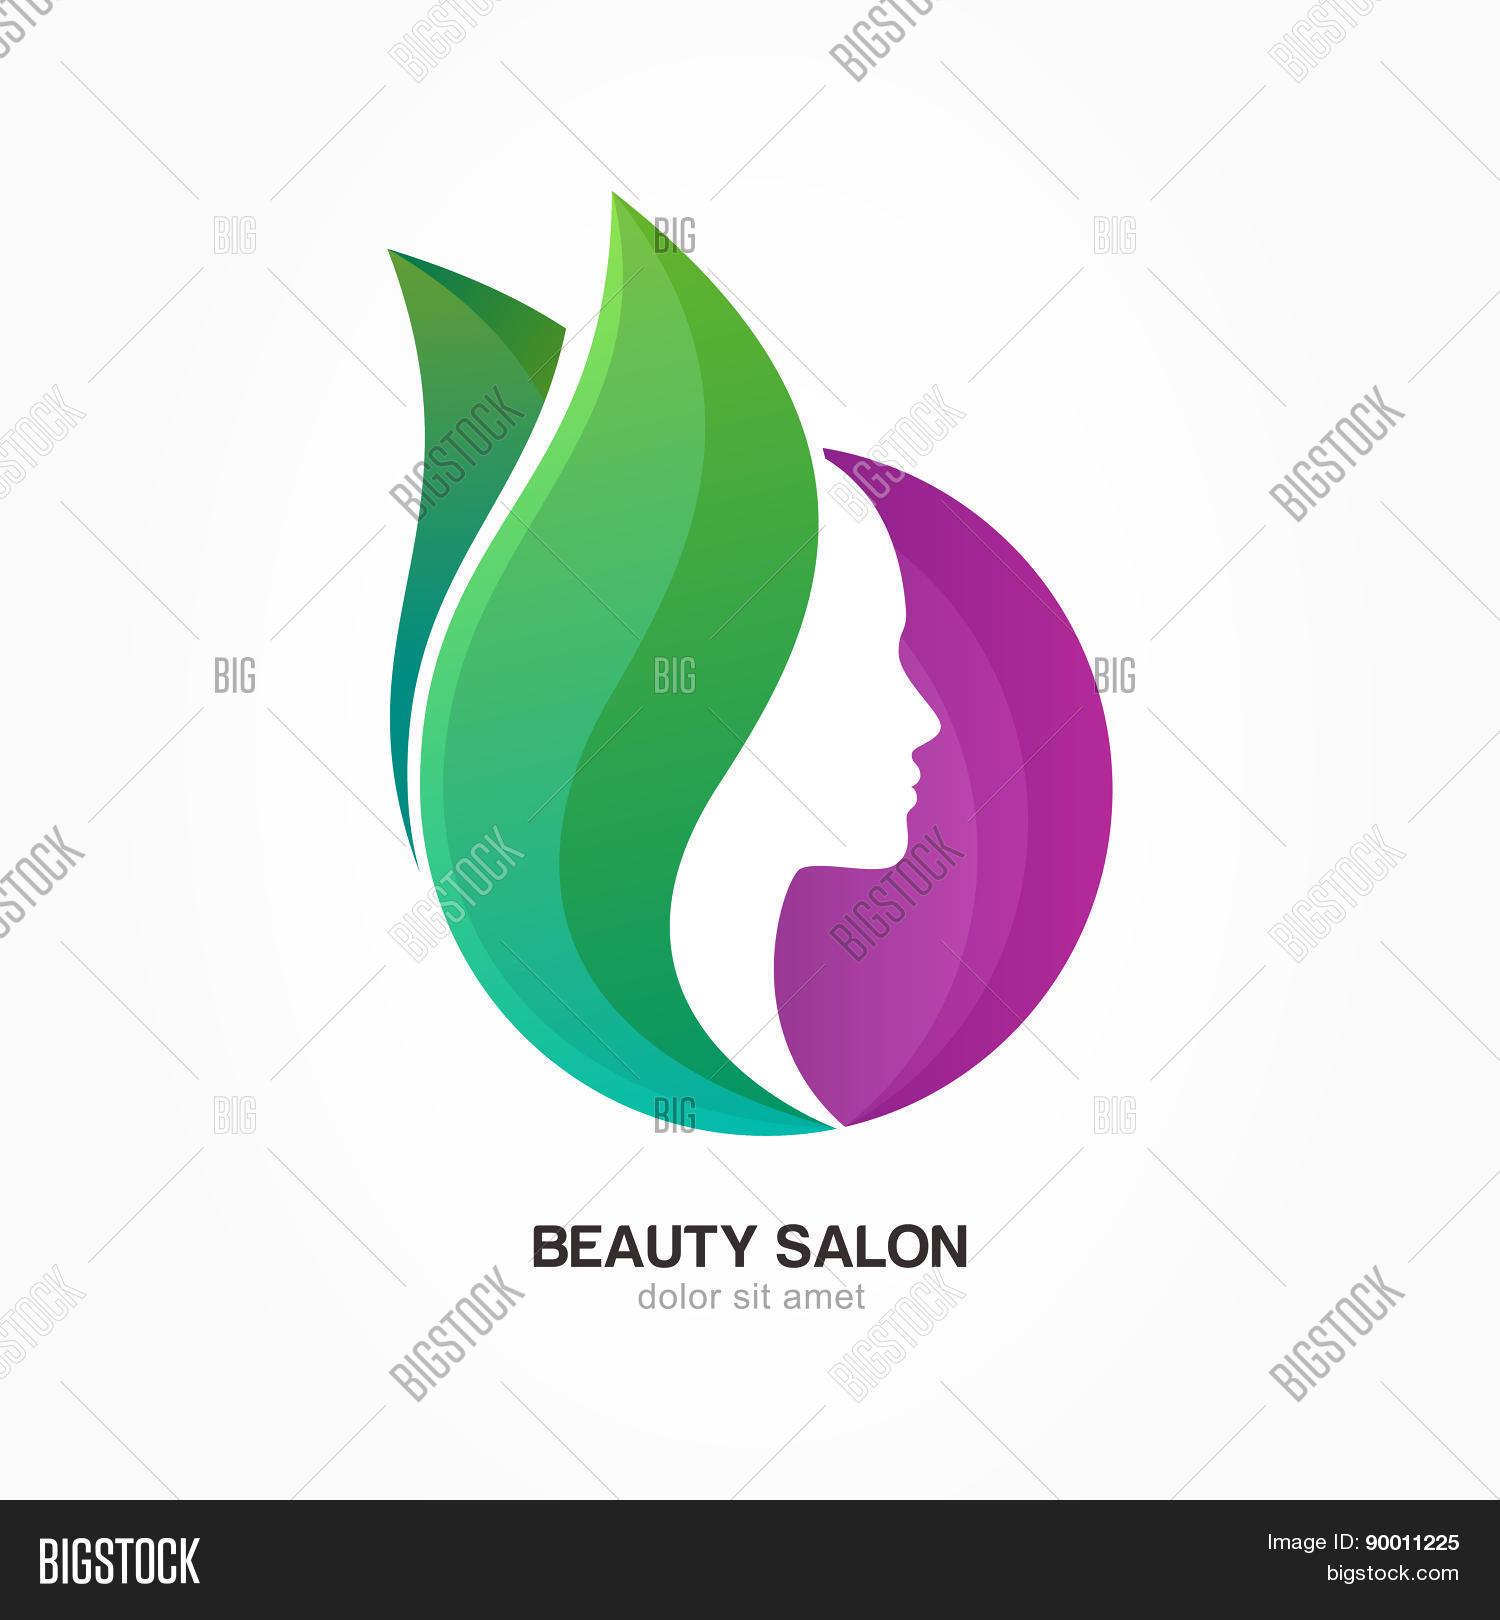 Woman 39 s face purple circle shape vector photo bigstock for Abstract beauty salon